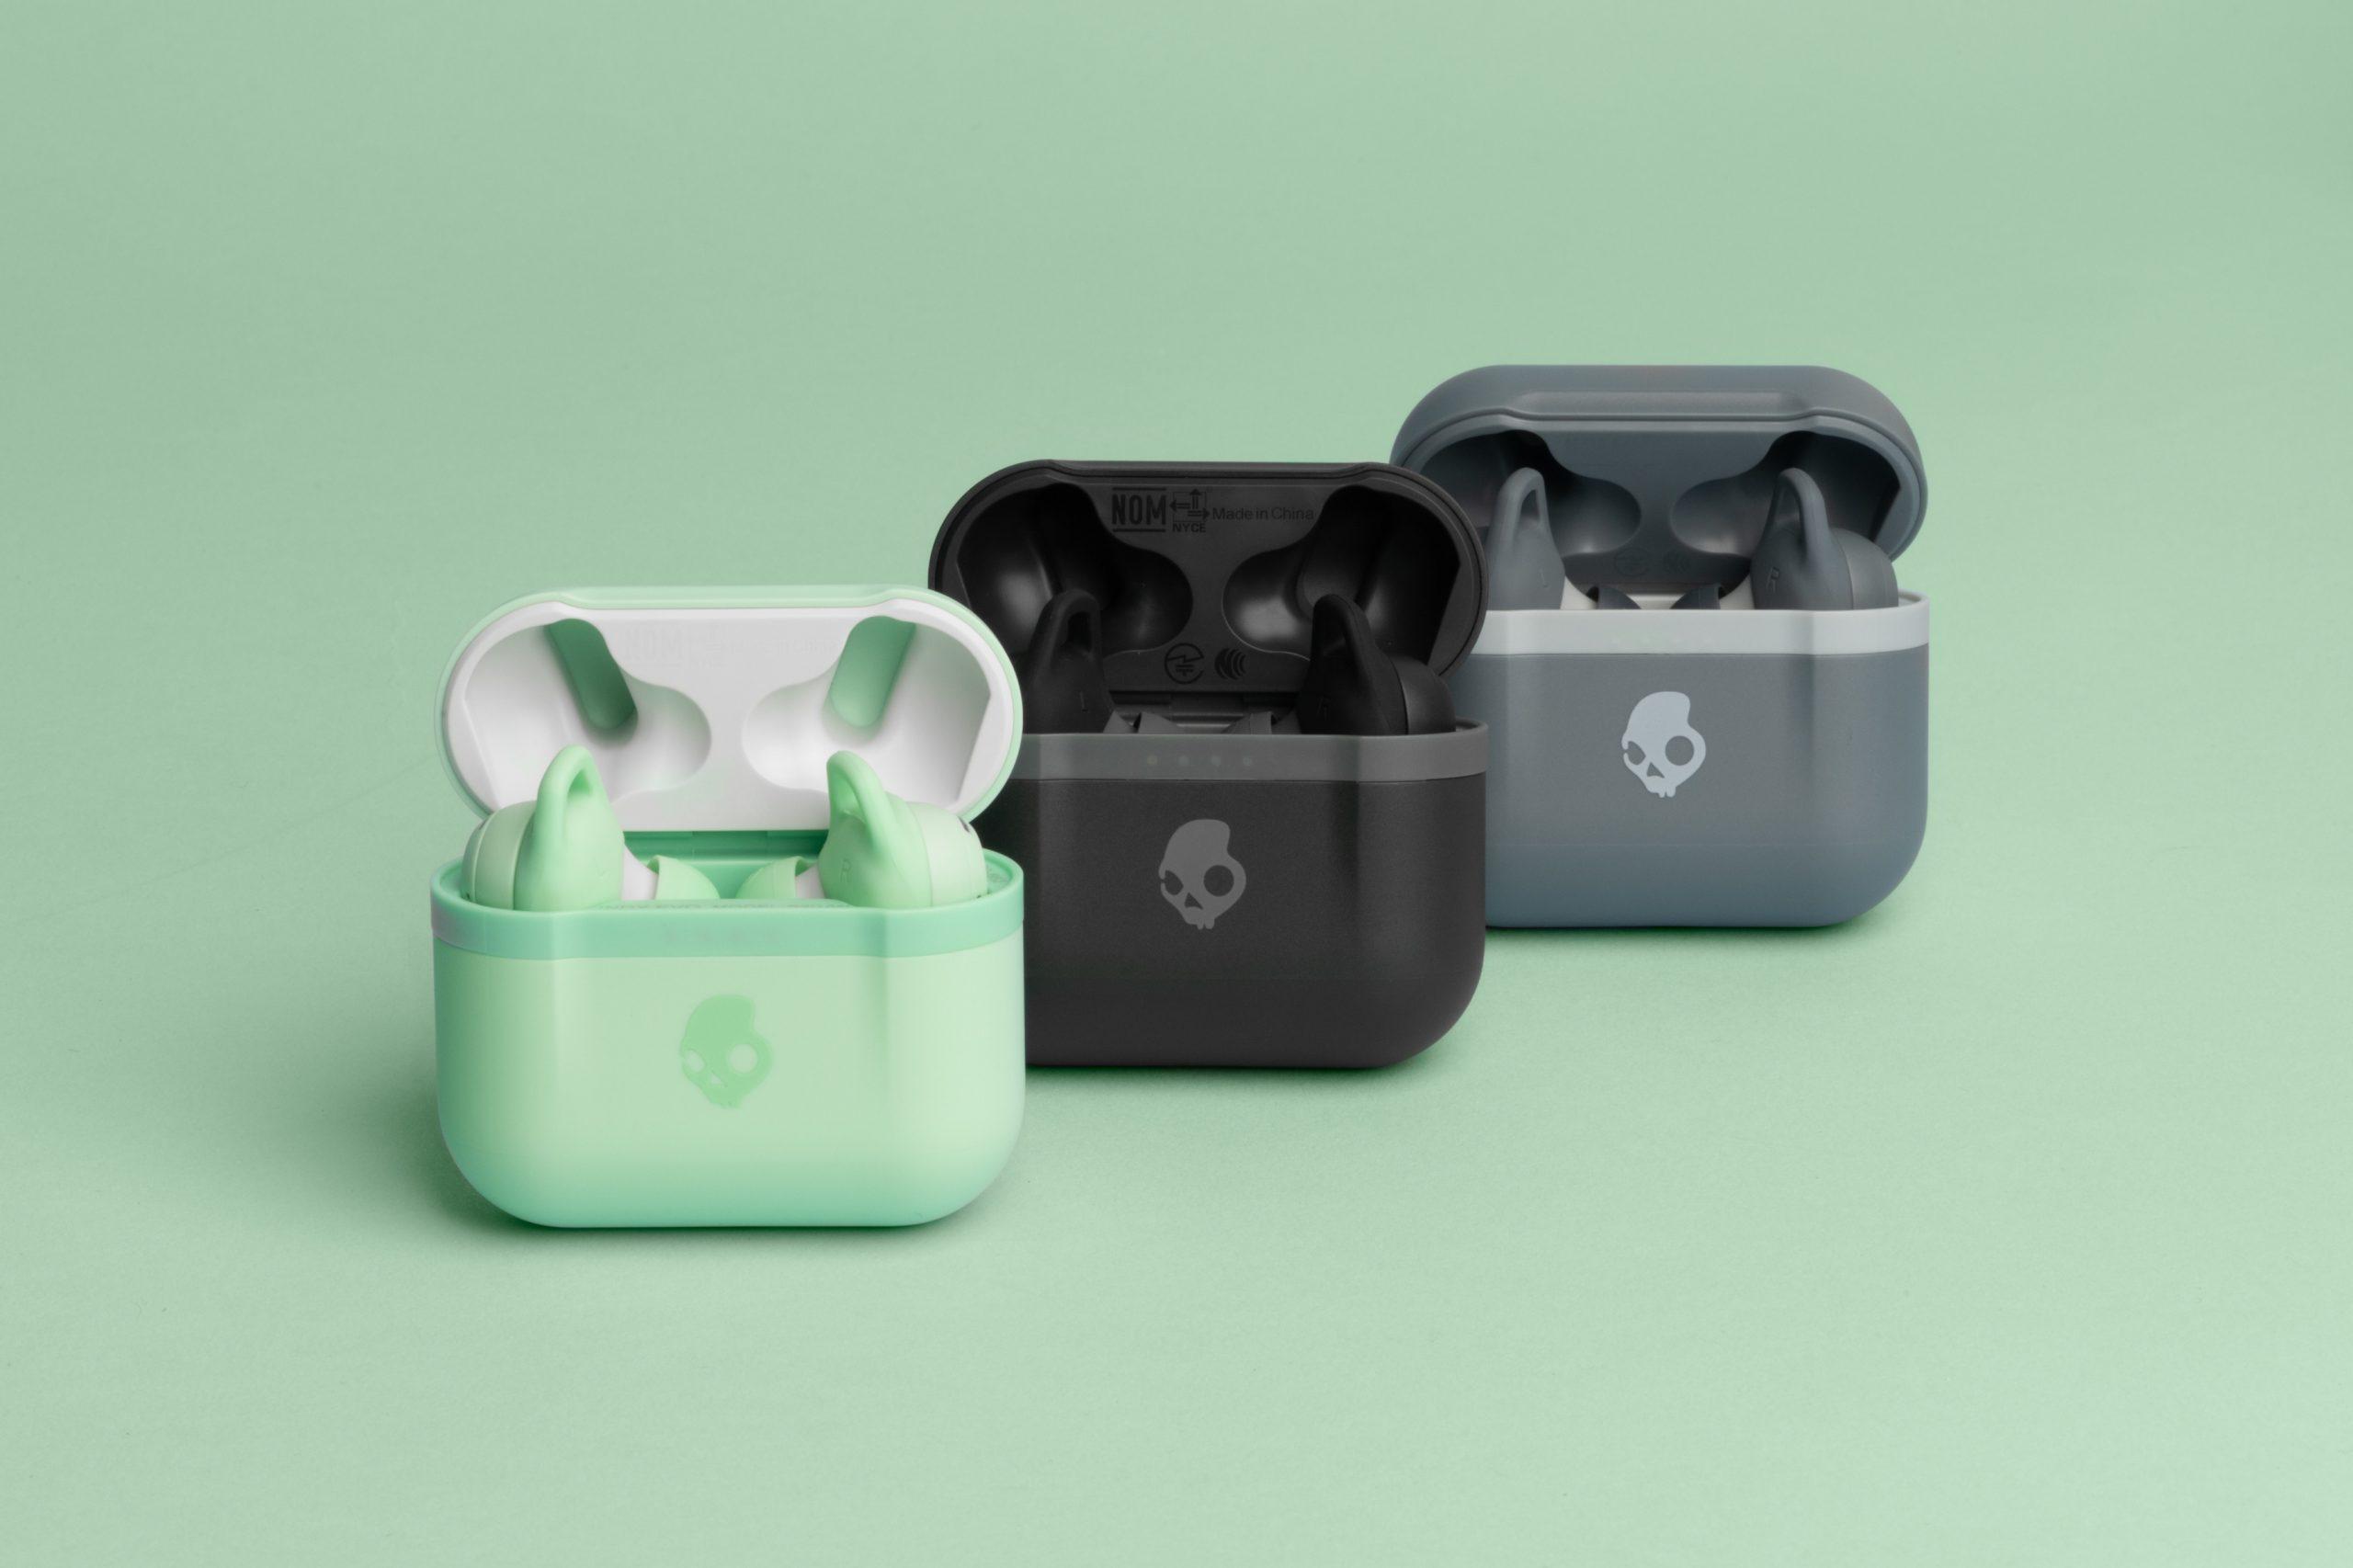 Auricolari True Wireless,ecco i nuovi modelli Skullcandy thumbnail